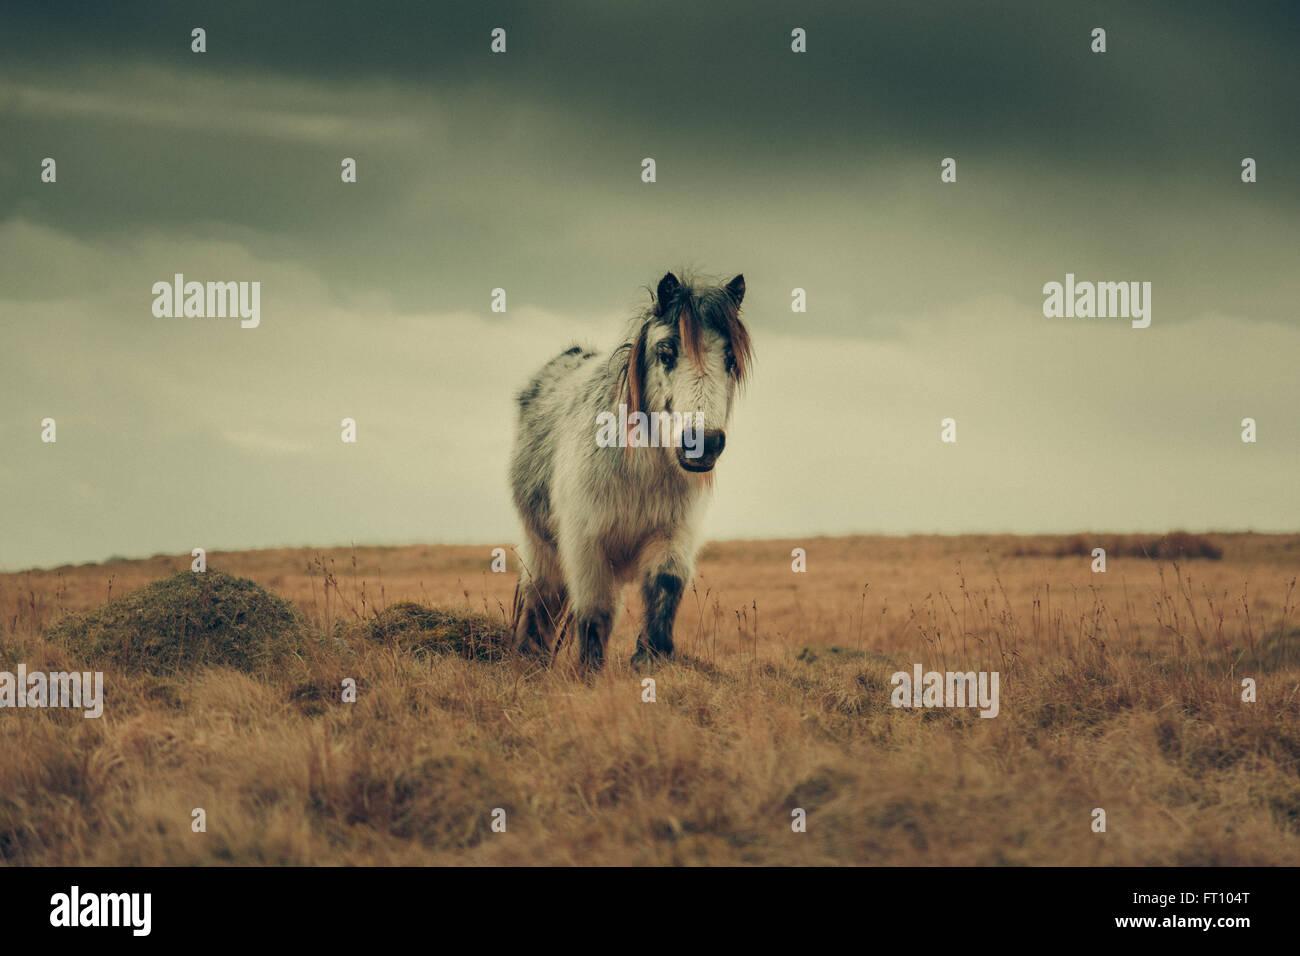 Horse at Brecon Beacons Wales Stock Photo